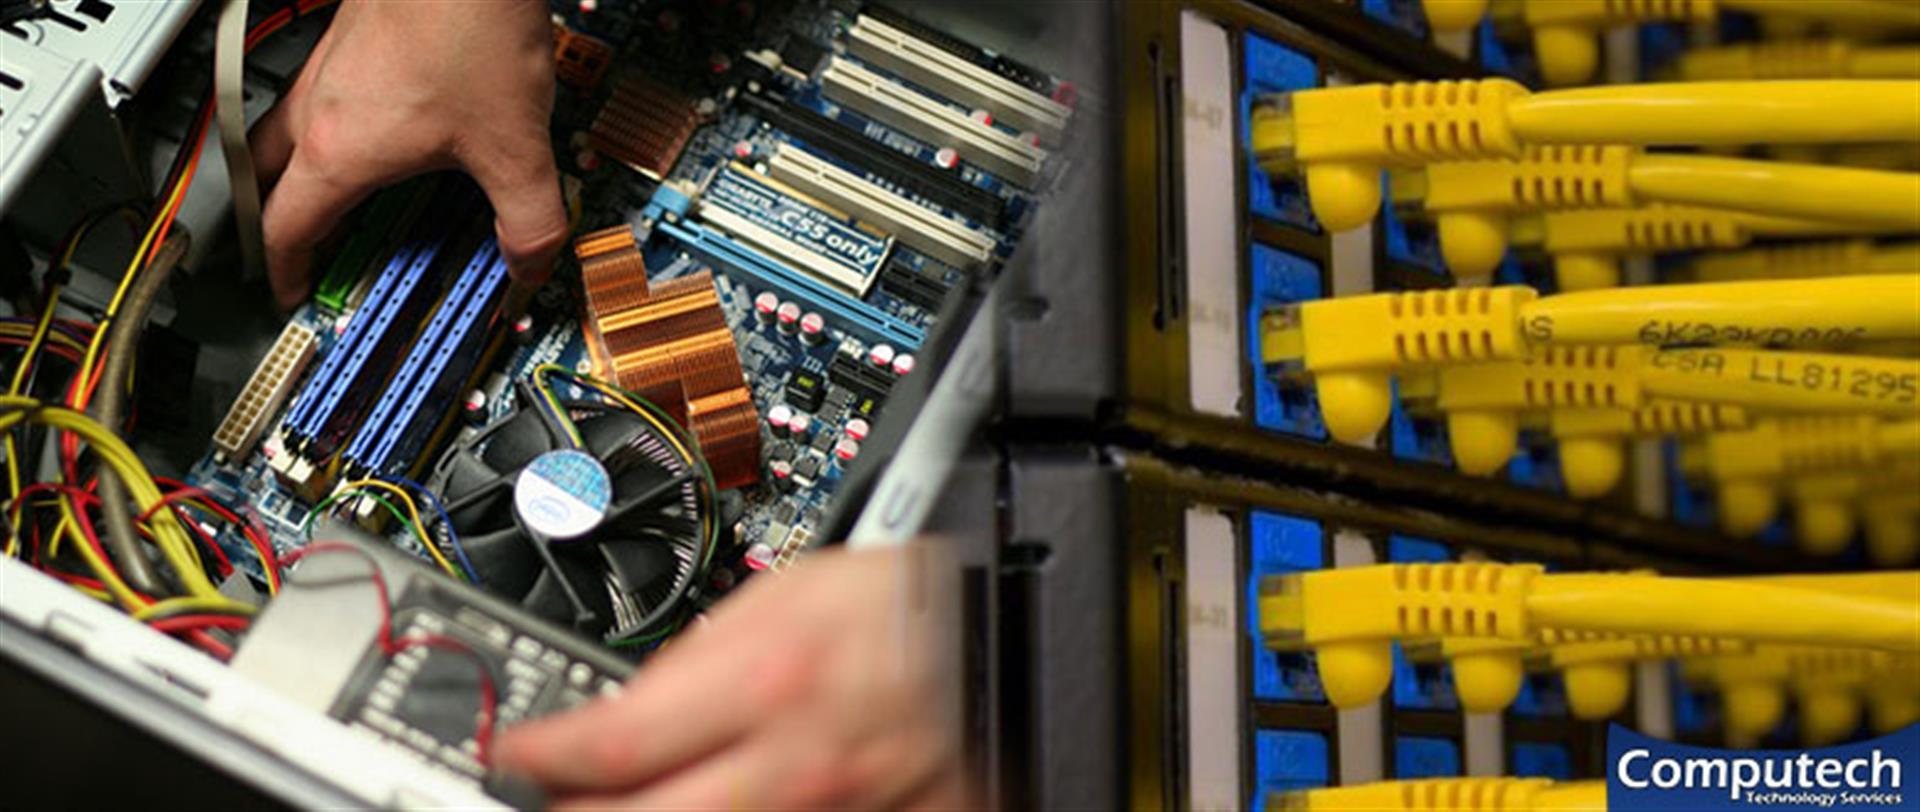 Peoria Arizona Onsite PC & Printer Repair, Network, Telecom and Data Wiring Solutions